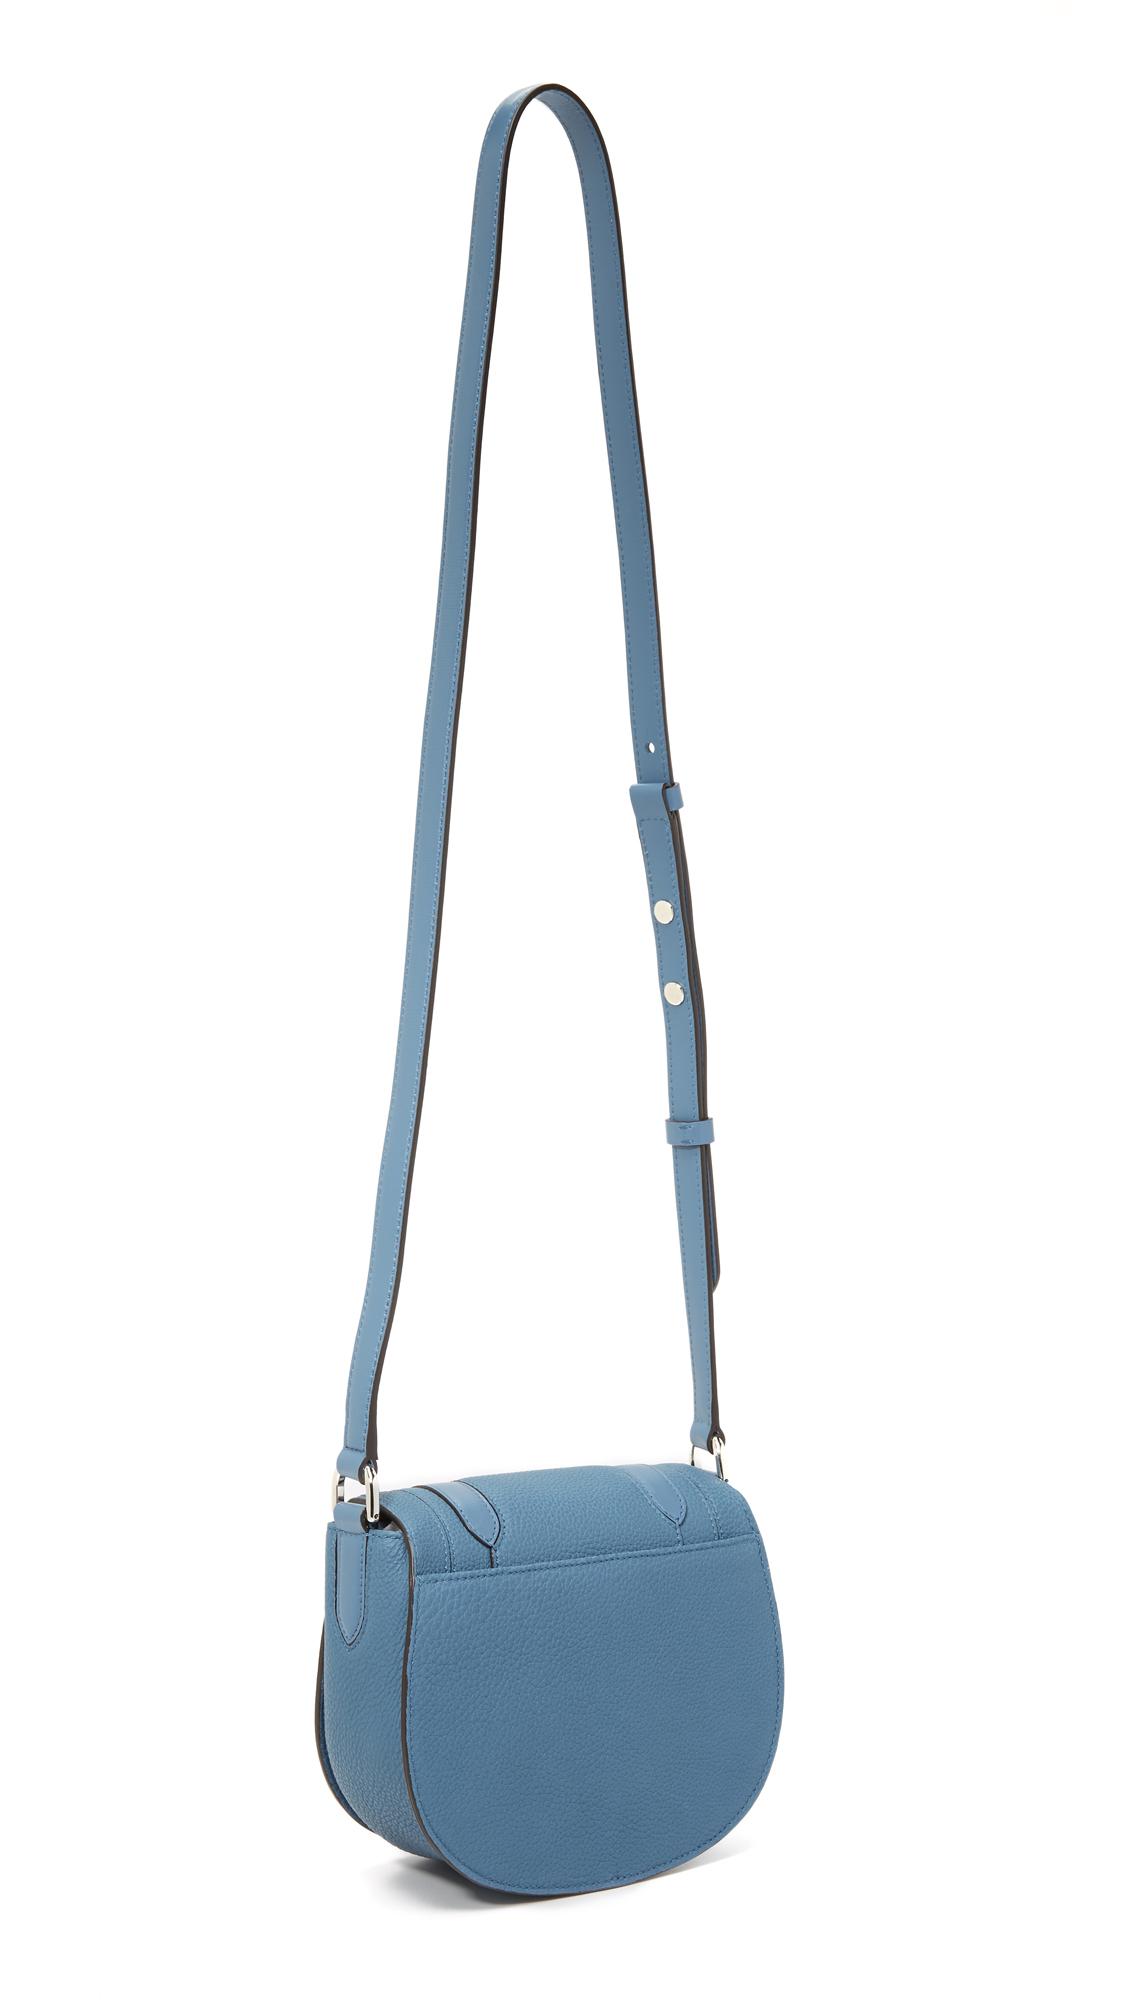 c7f2a7dbf02c Michael Kors Skorpios Small Cross Body Bag in Blue - Lyst